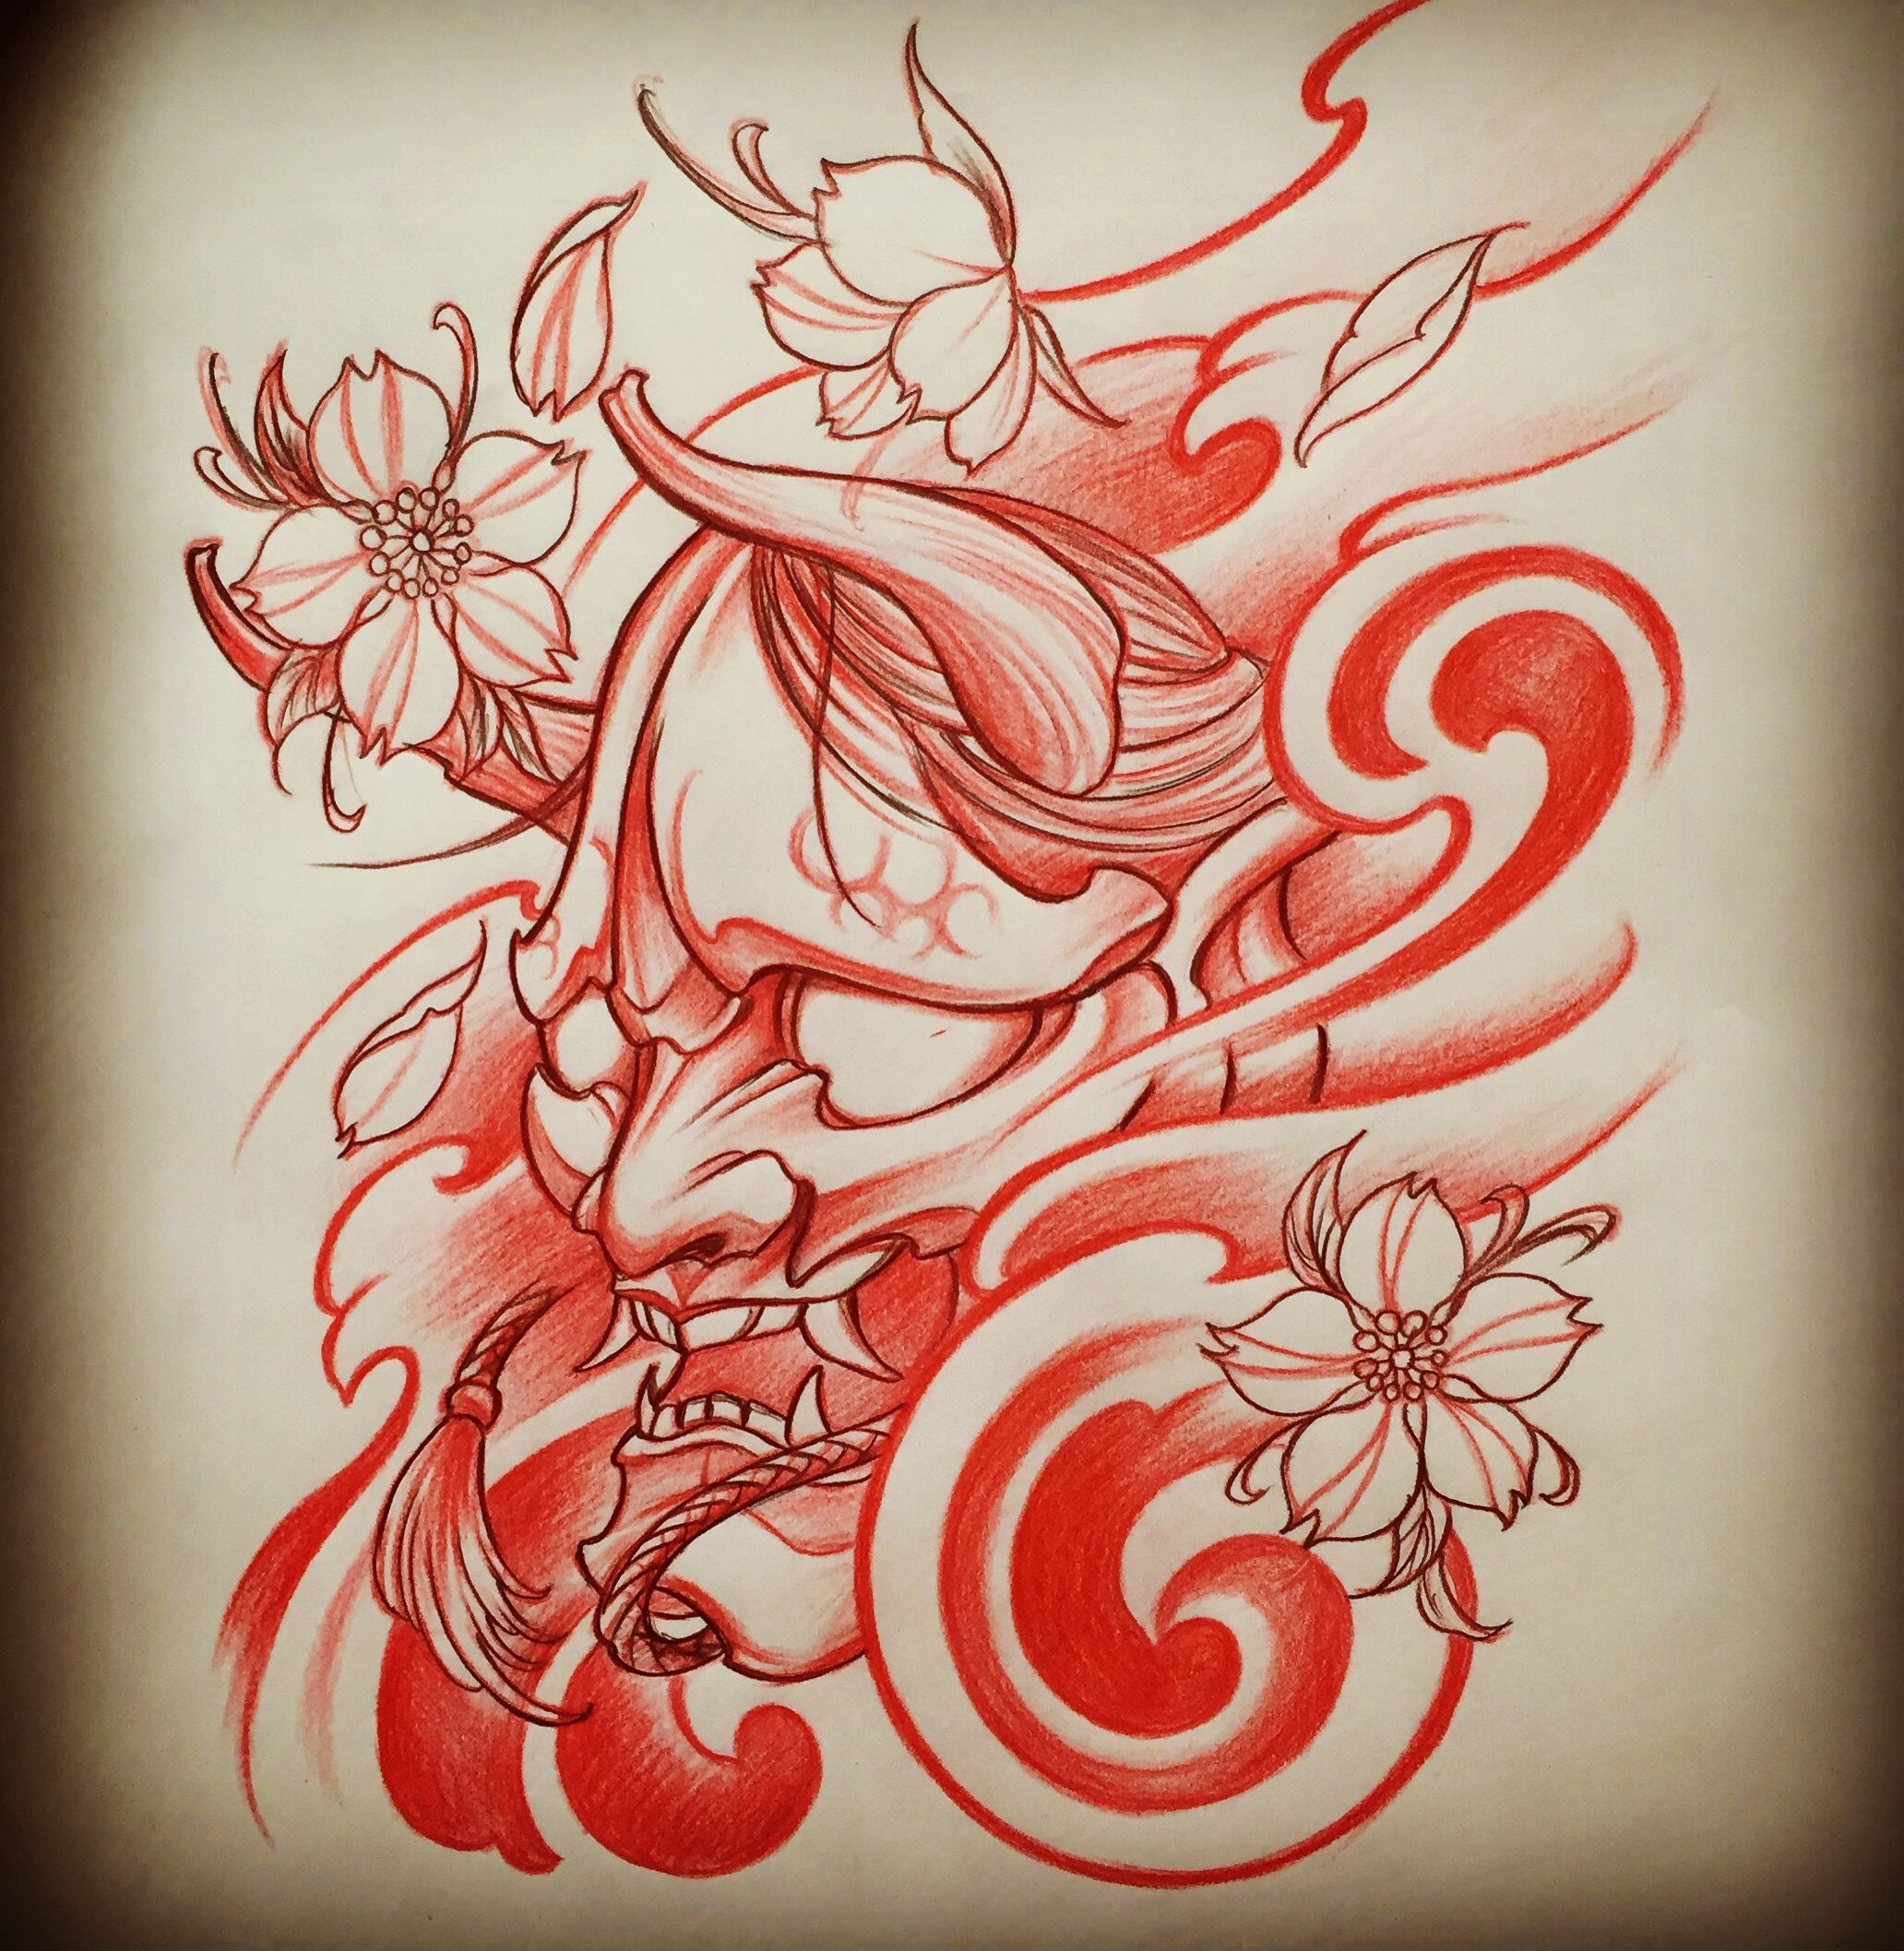 amsterdam tattoo 1825 kimihito hannya mask japanese style tattoo design kimihito tattoo design. Black Bedroom Furniture Sets. Home Design Ideas